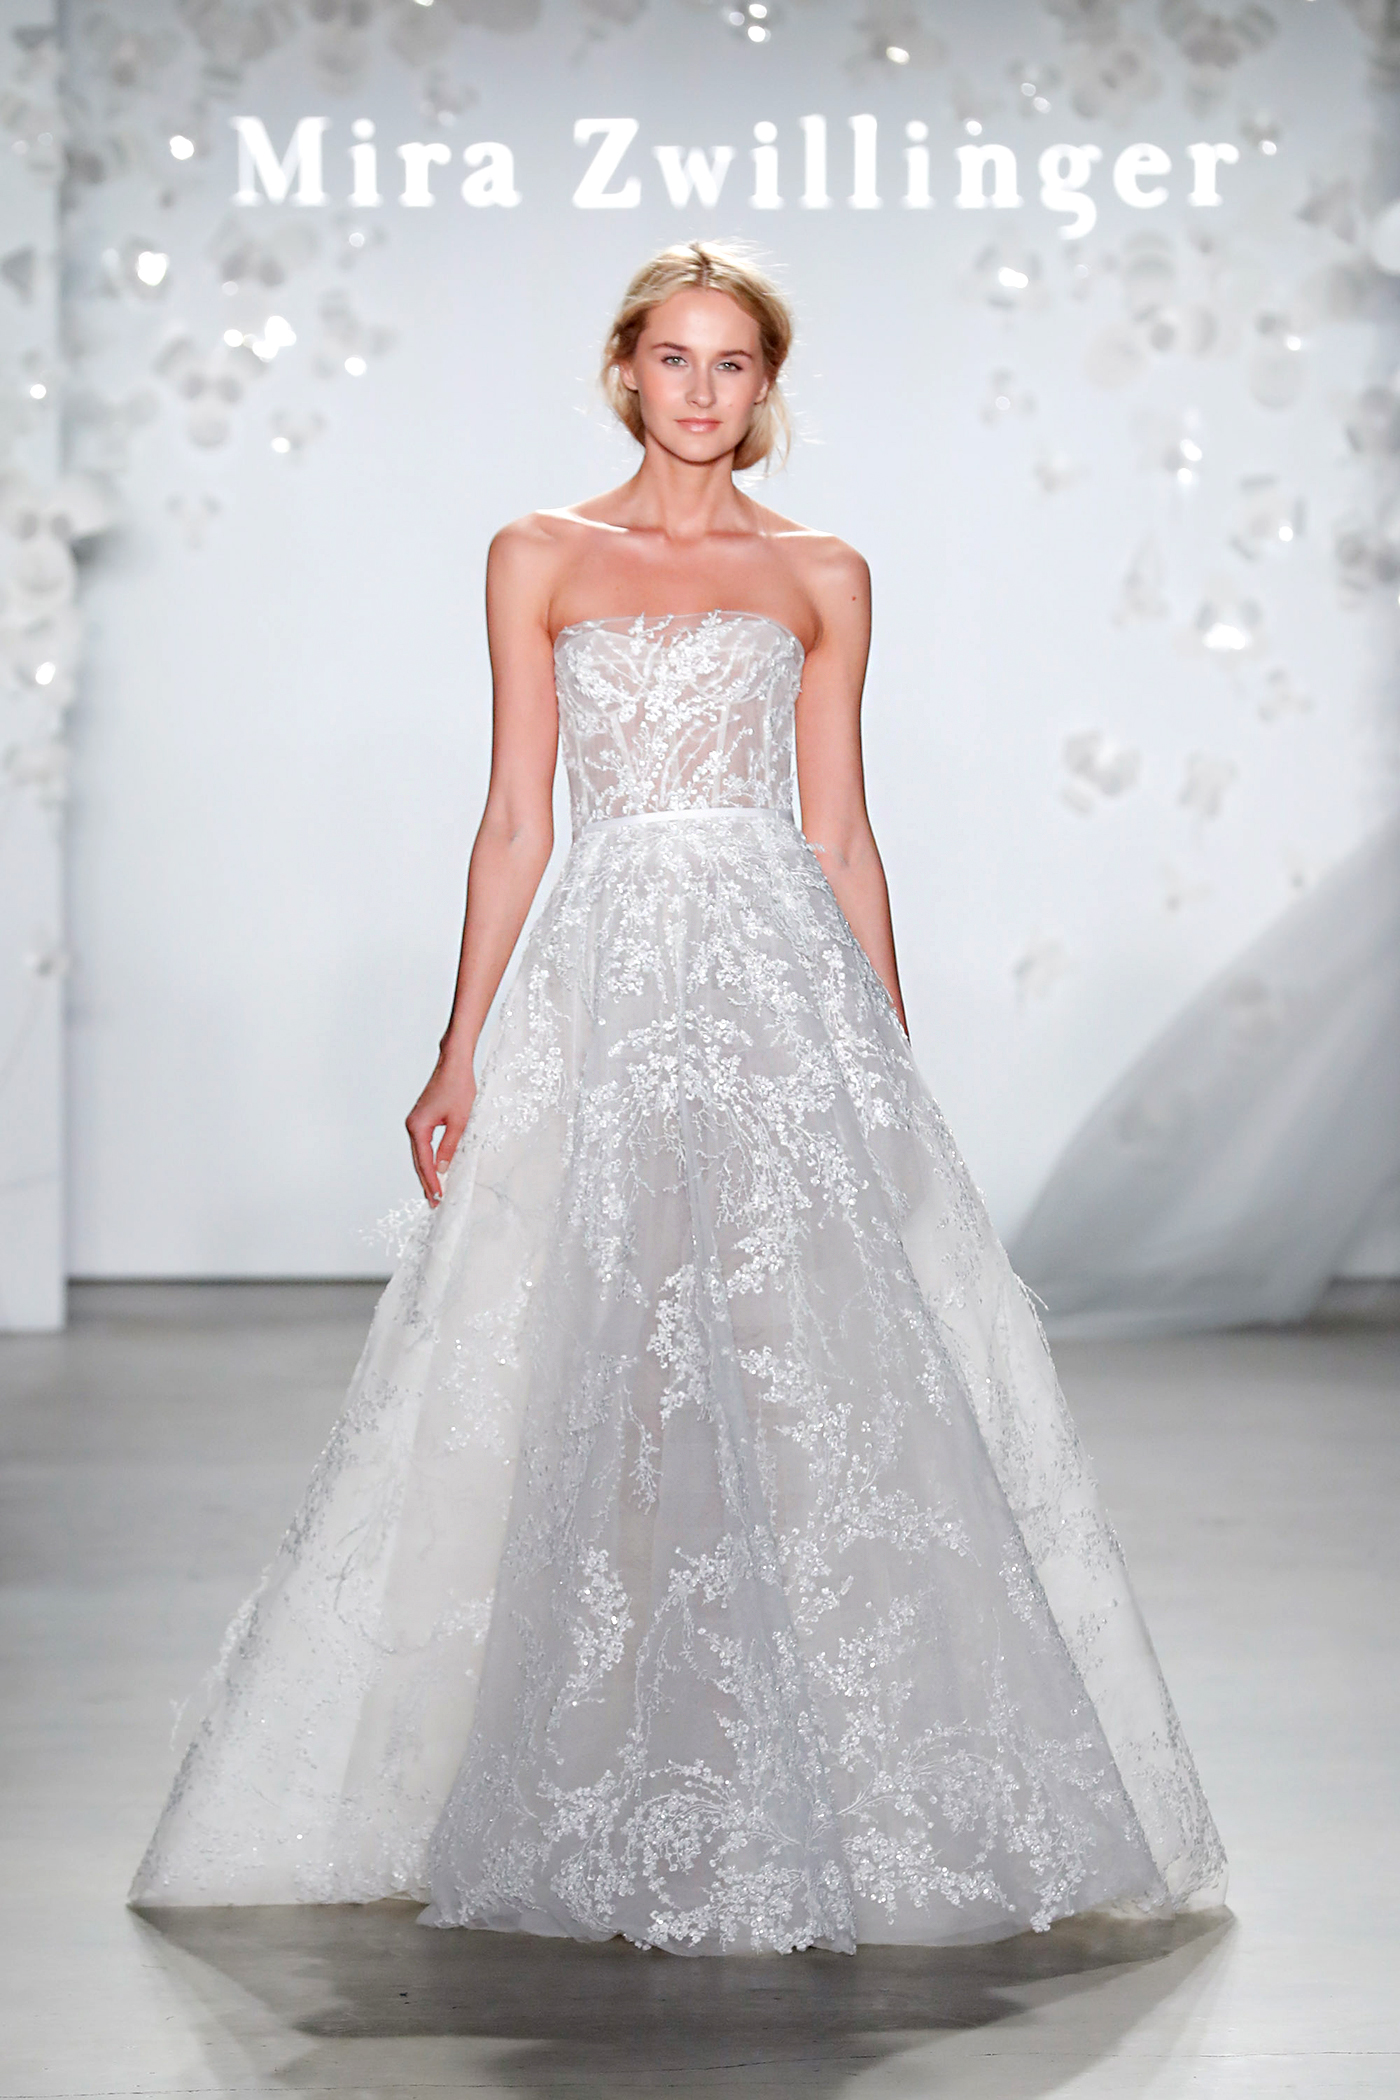 280752ee289db Mira Zwillinger Spring 2020 Wedding Dress Collection | Martha ...